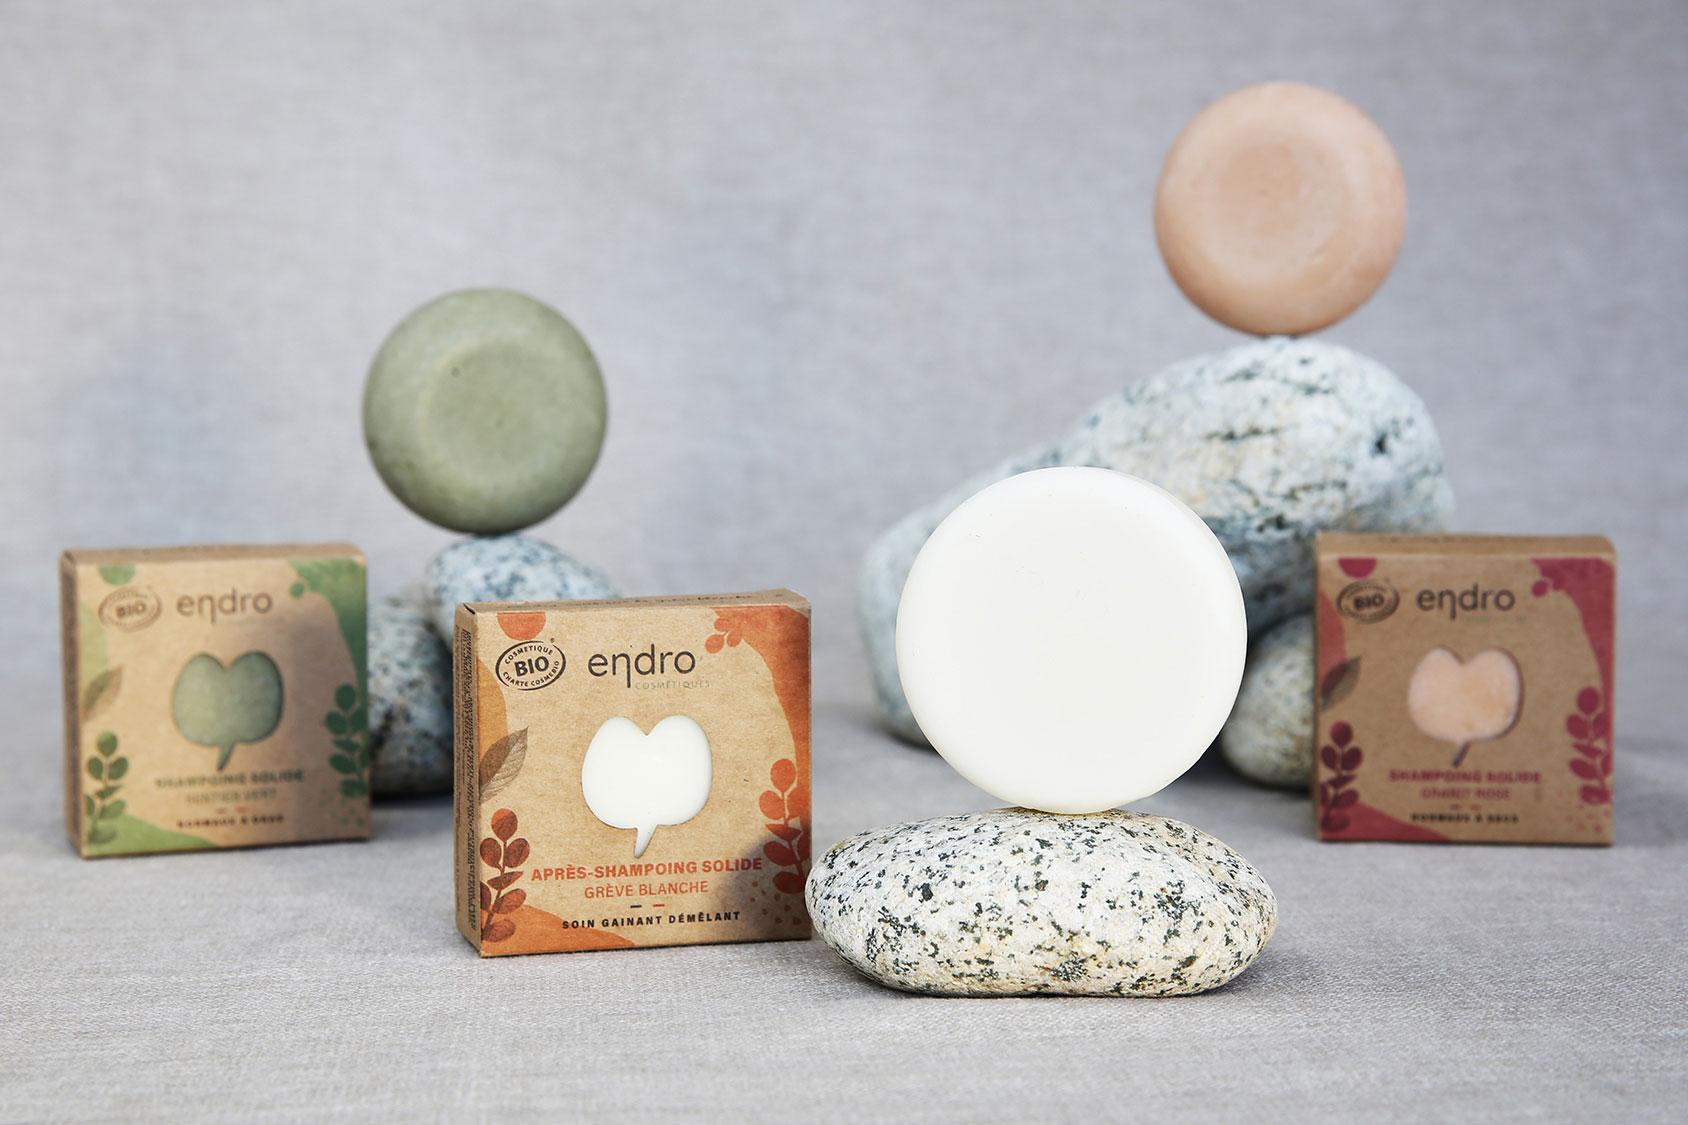 Creer et imprimer un packaging cosmetique-Coqueliko-Lannion